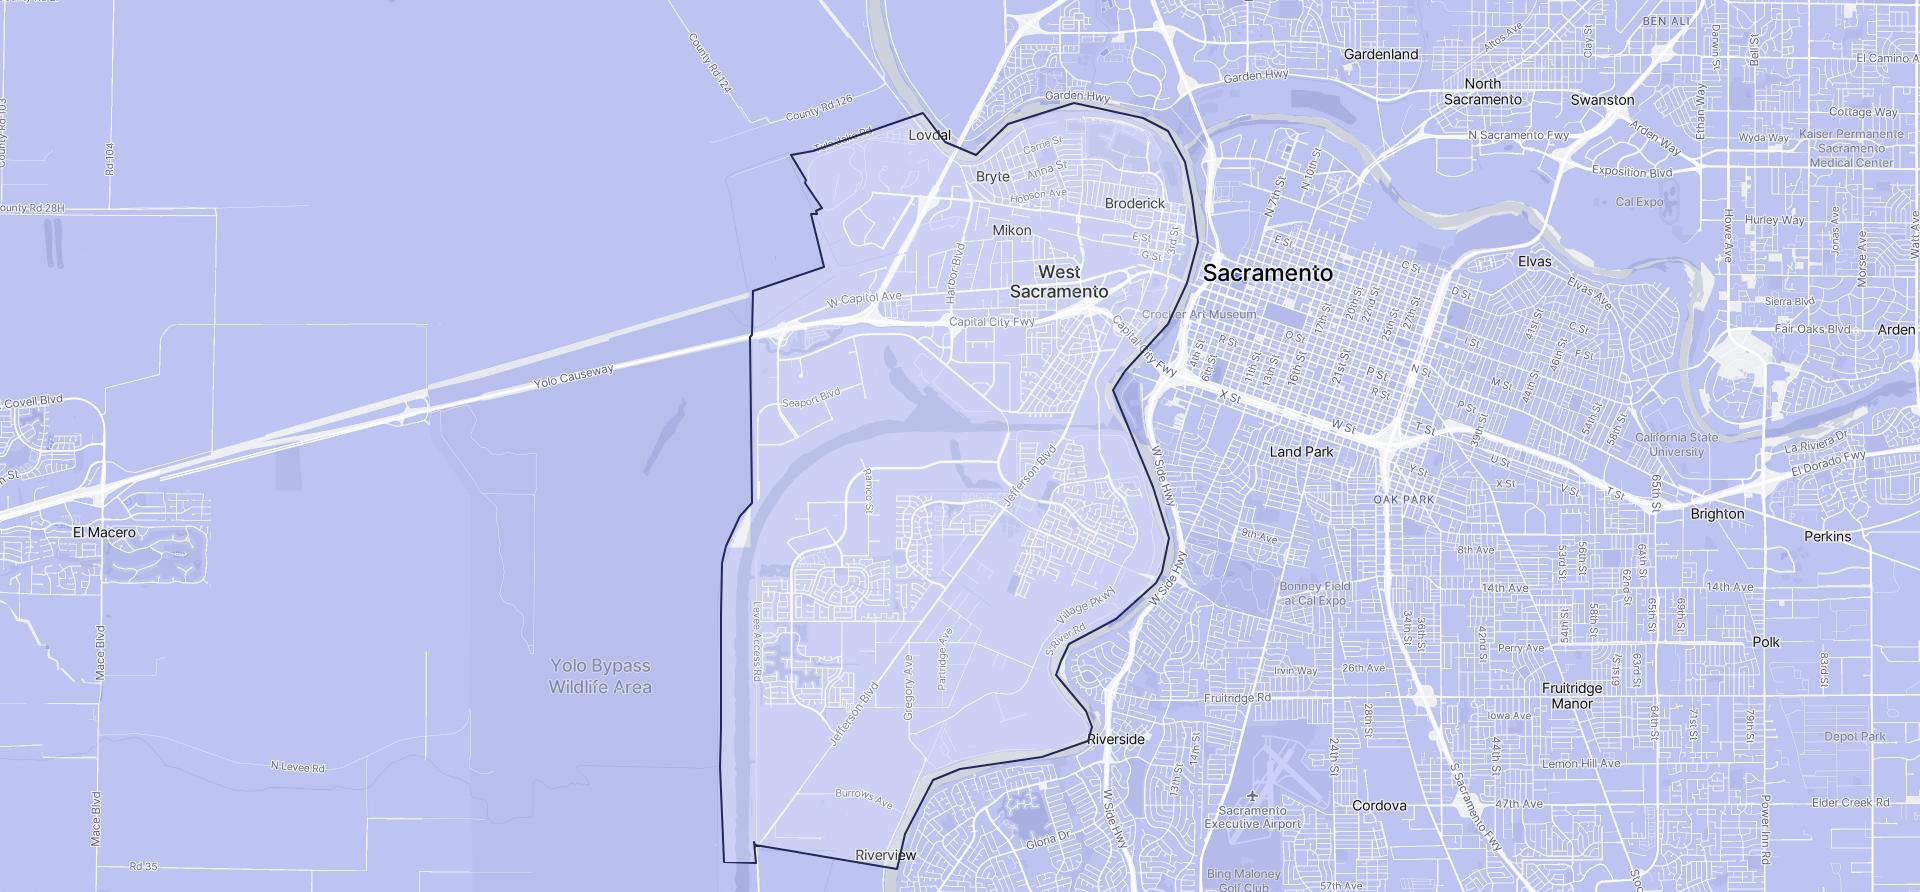 Image of West Sacramento boundaries on a map.